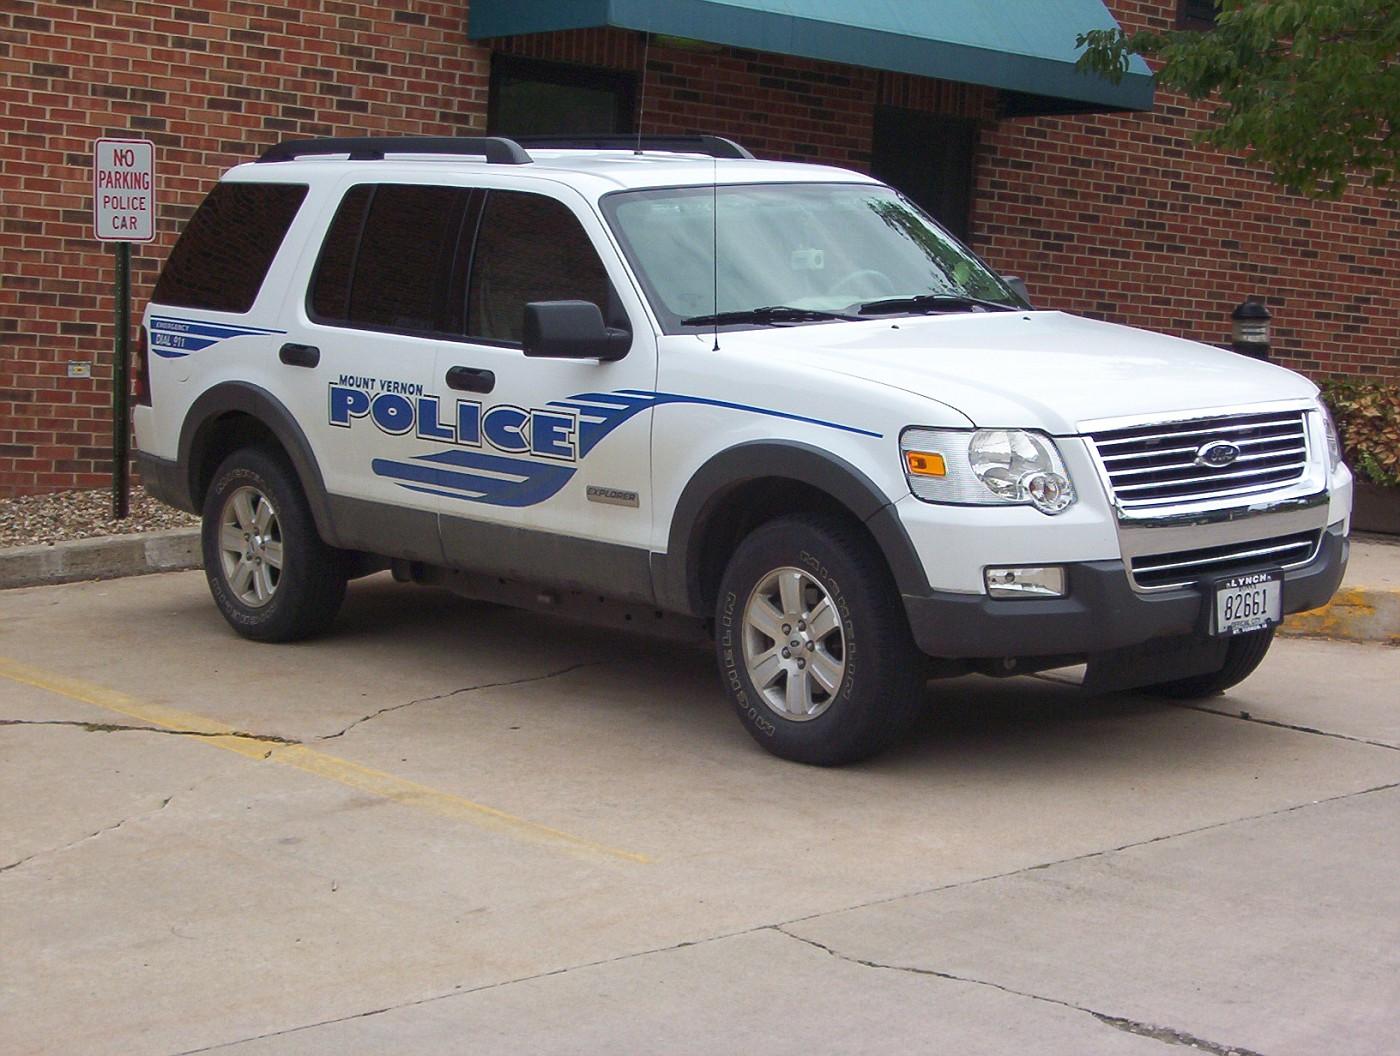 IA - Mount Vernon Police